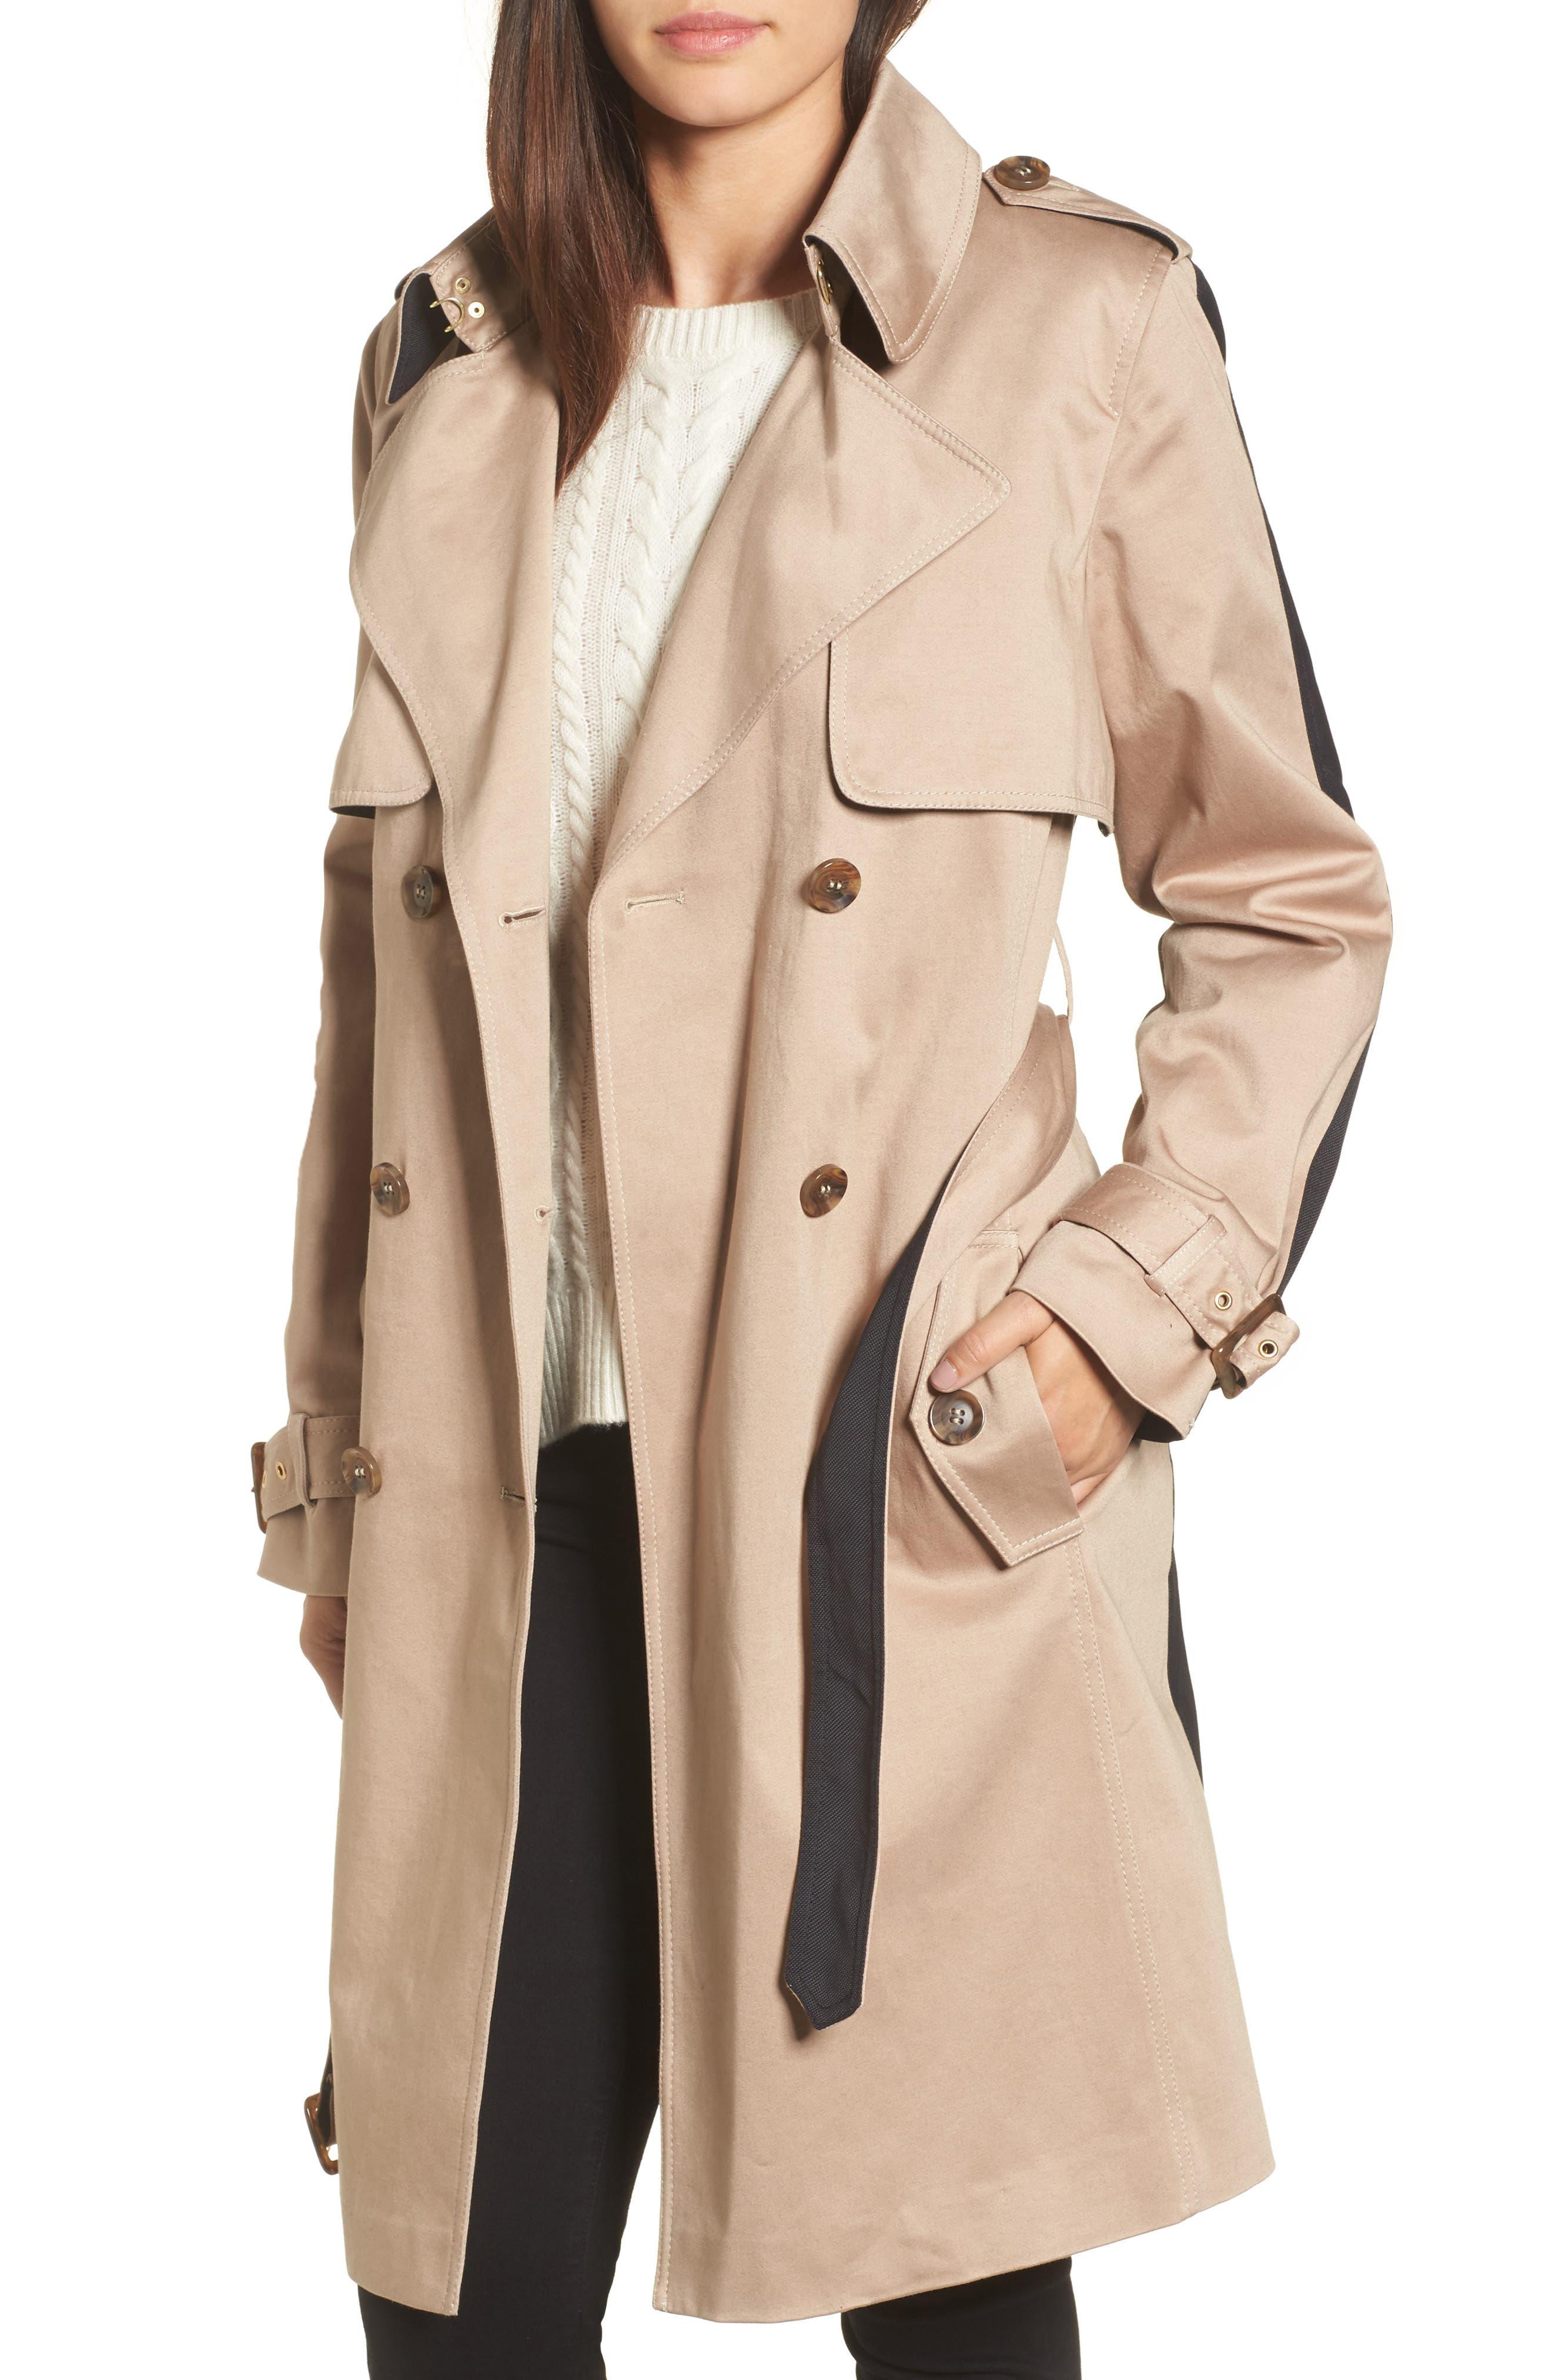 Trina Turk Allison Two-Tone Trench Coat